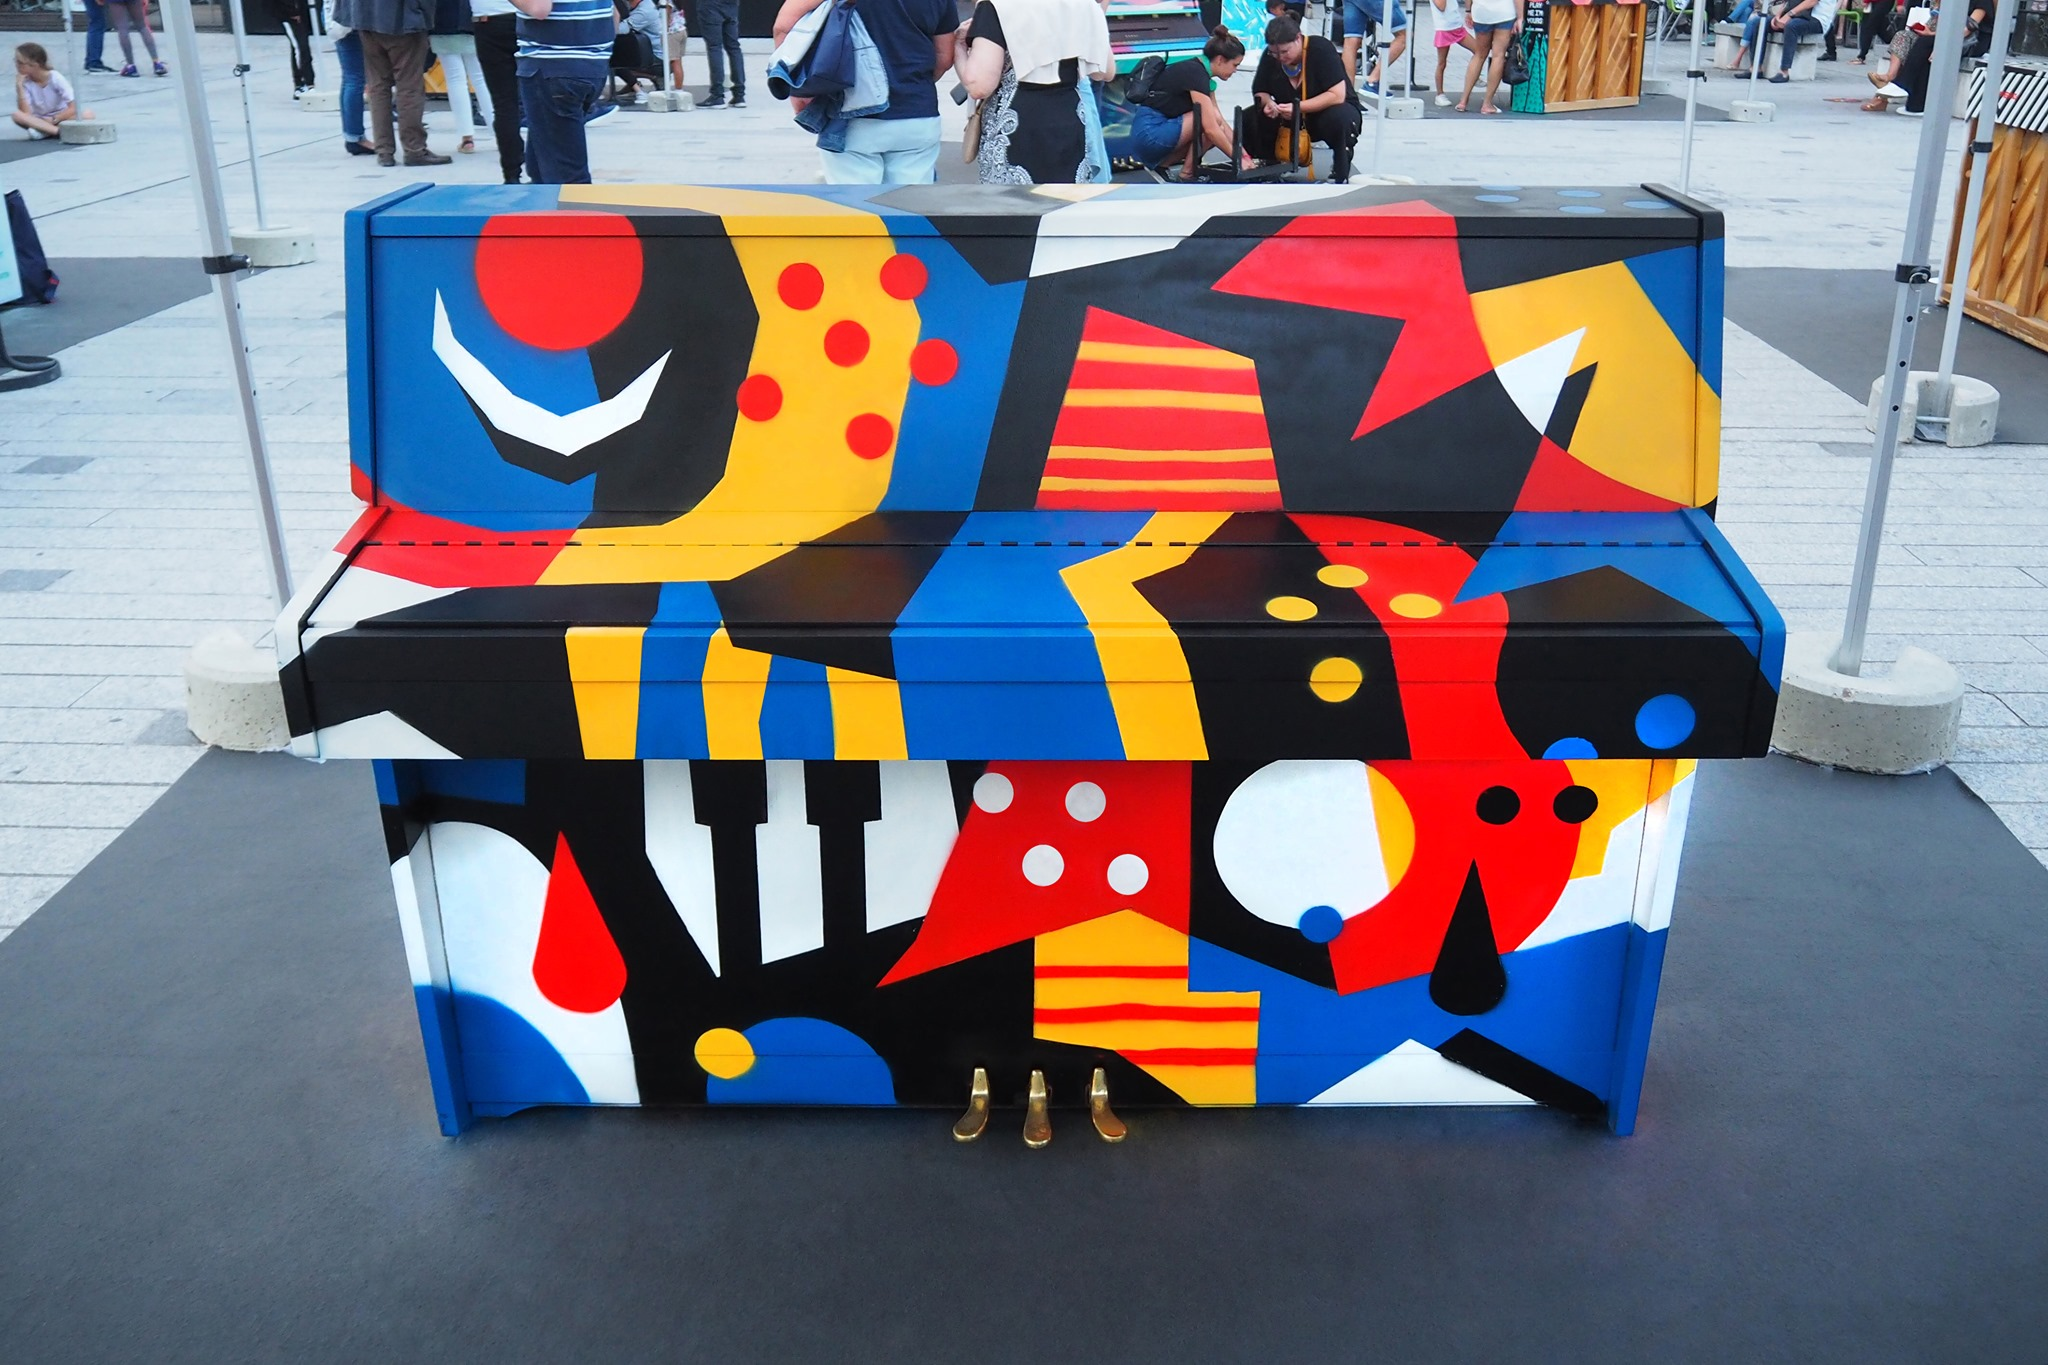 Piano customisé par un street artist